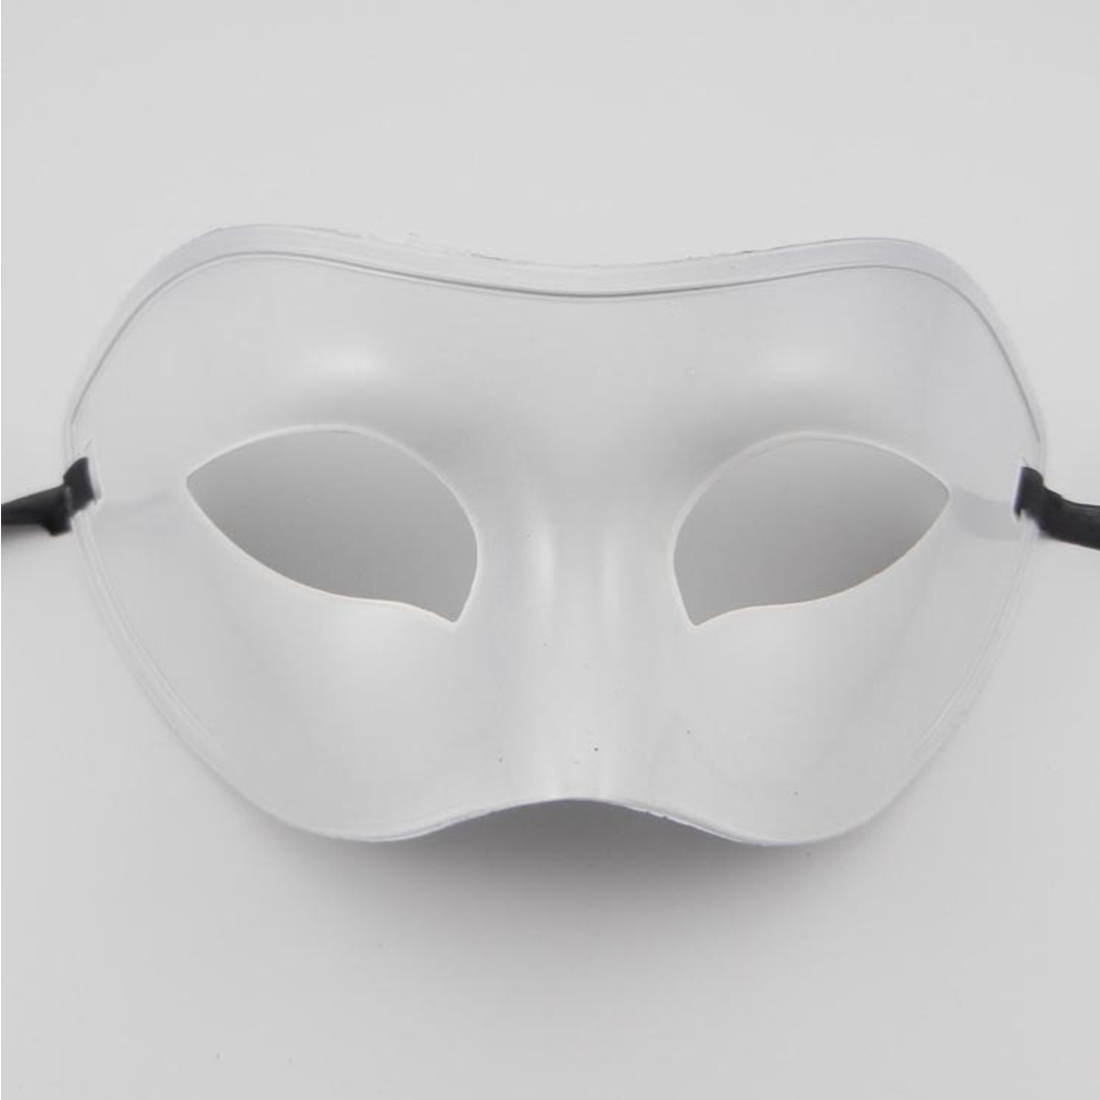 Men Women Sexy Costume Prom Mask Venetian Mardi Gras Party Dance Masquerade Ball Halloween Carnaval Mask Fancy Dress Costume